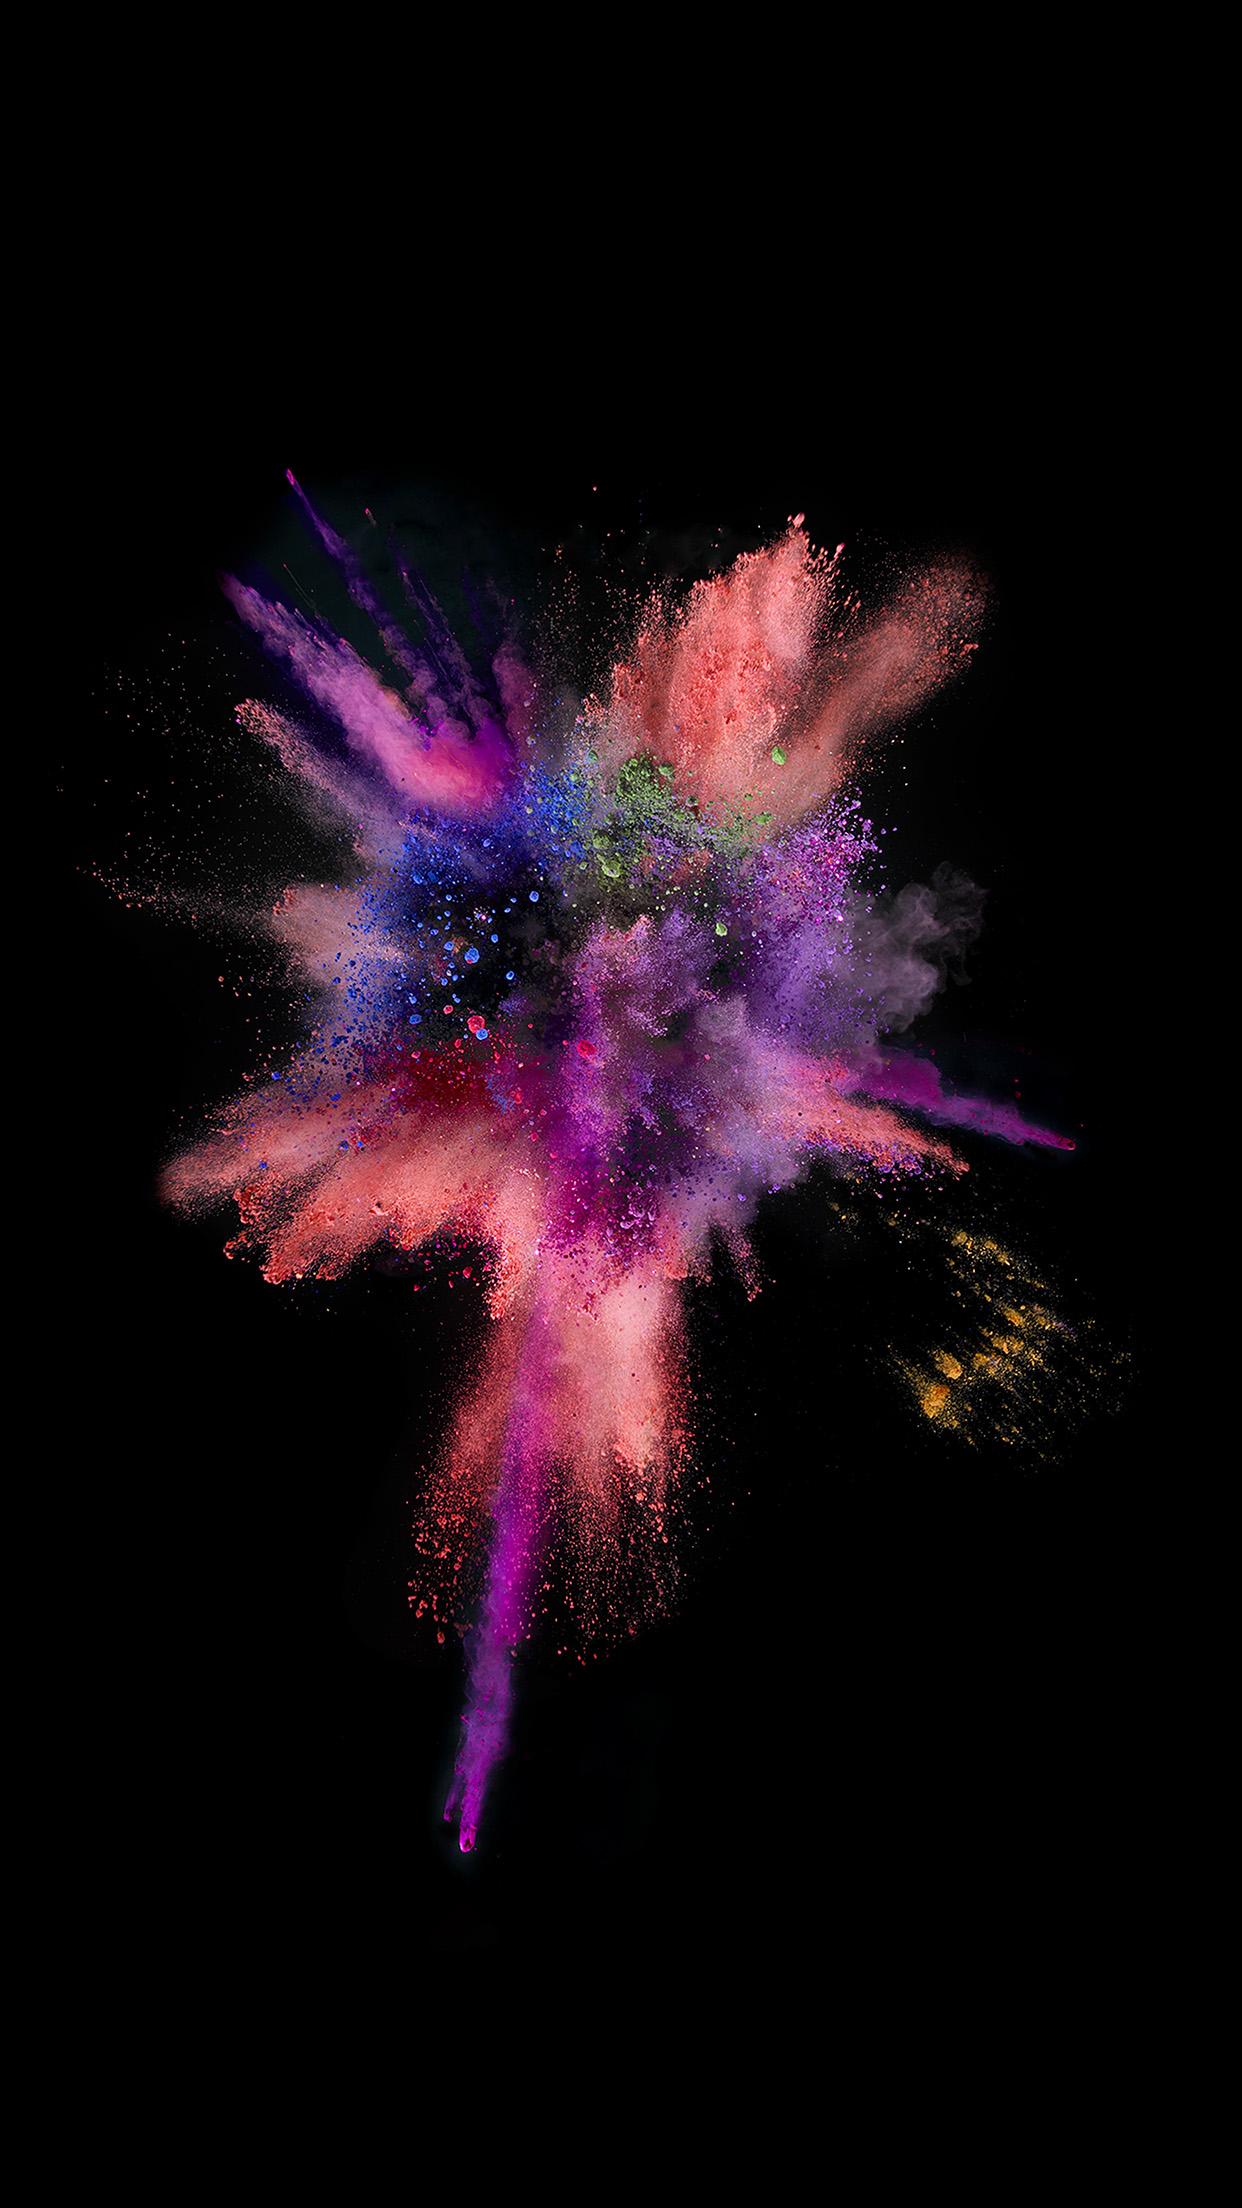 Iphone6papers An55 Apple Dark Spark Ios9 Iphone6s Color Rainbow